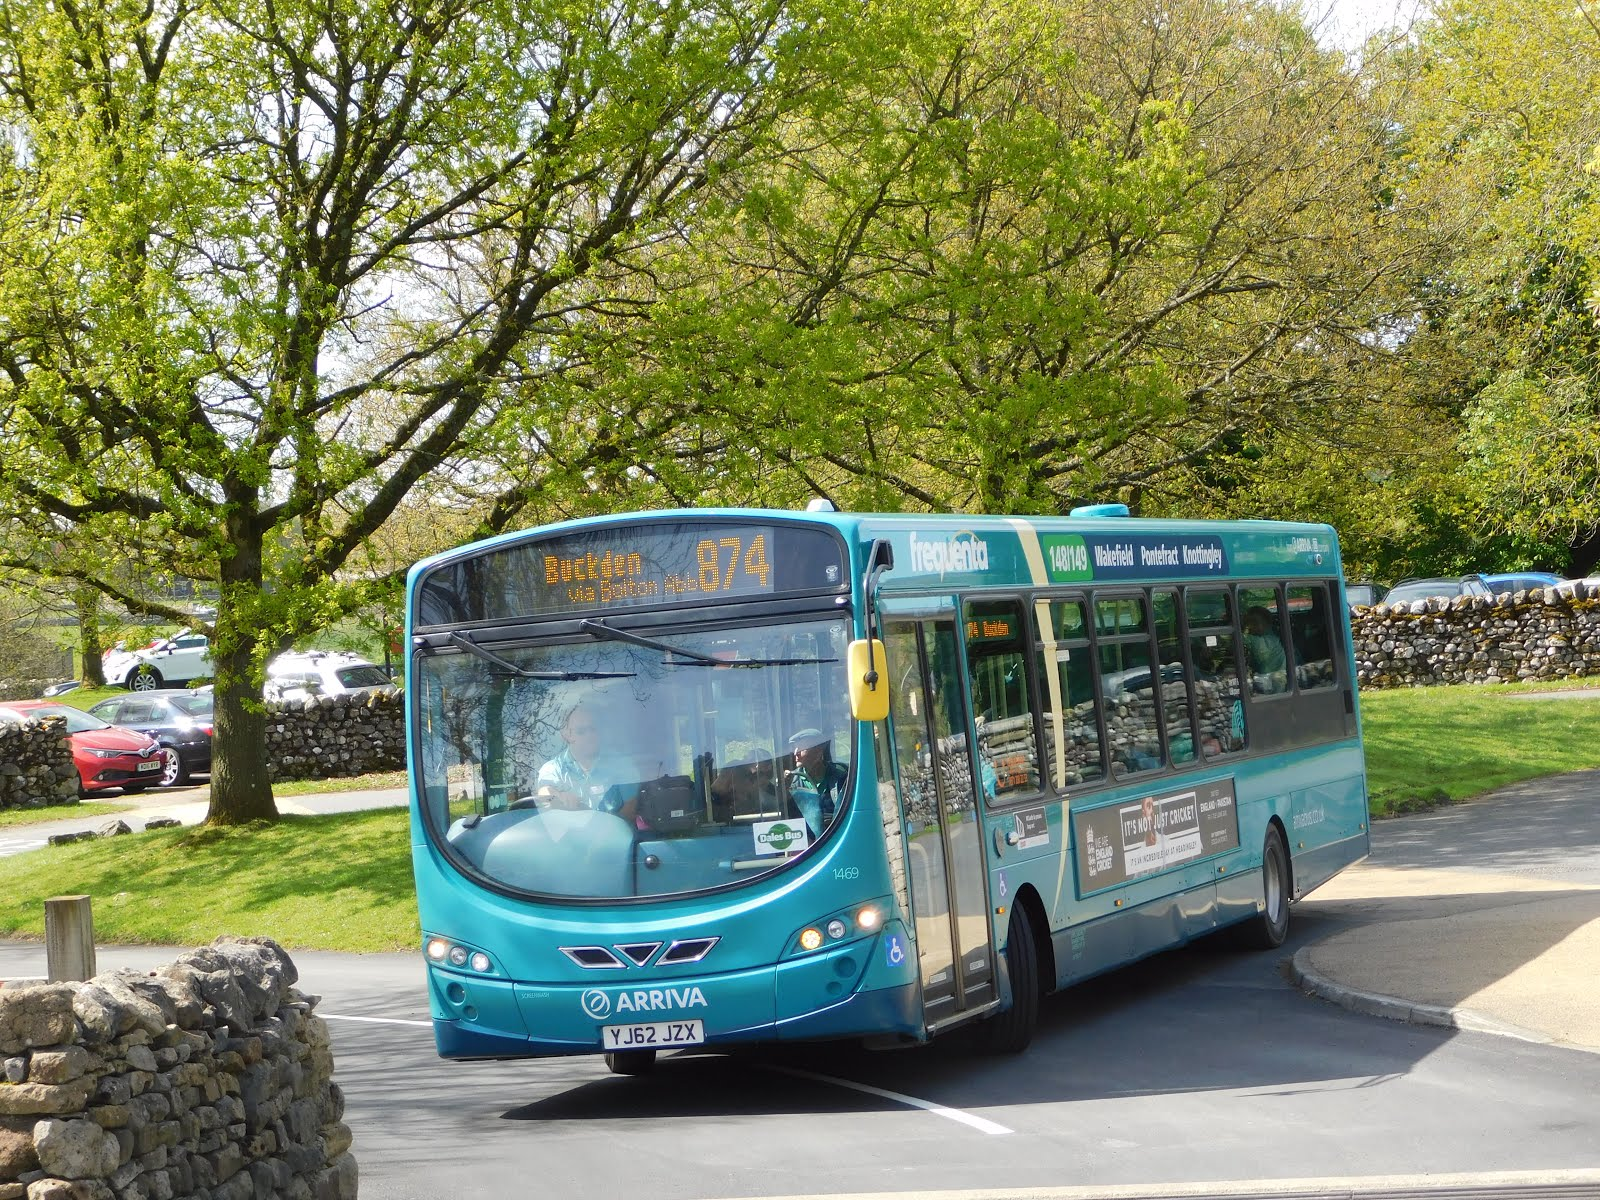 West Yorkshire Bus Adventures!